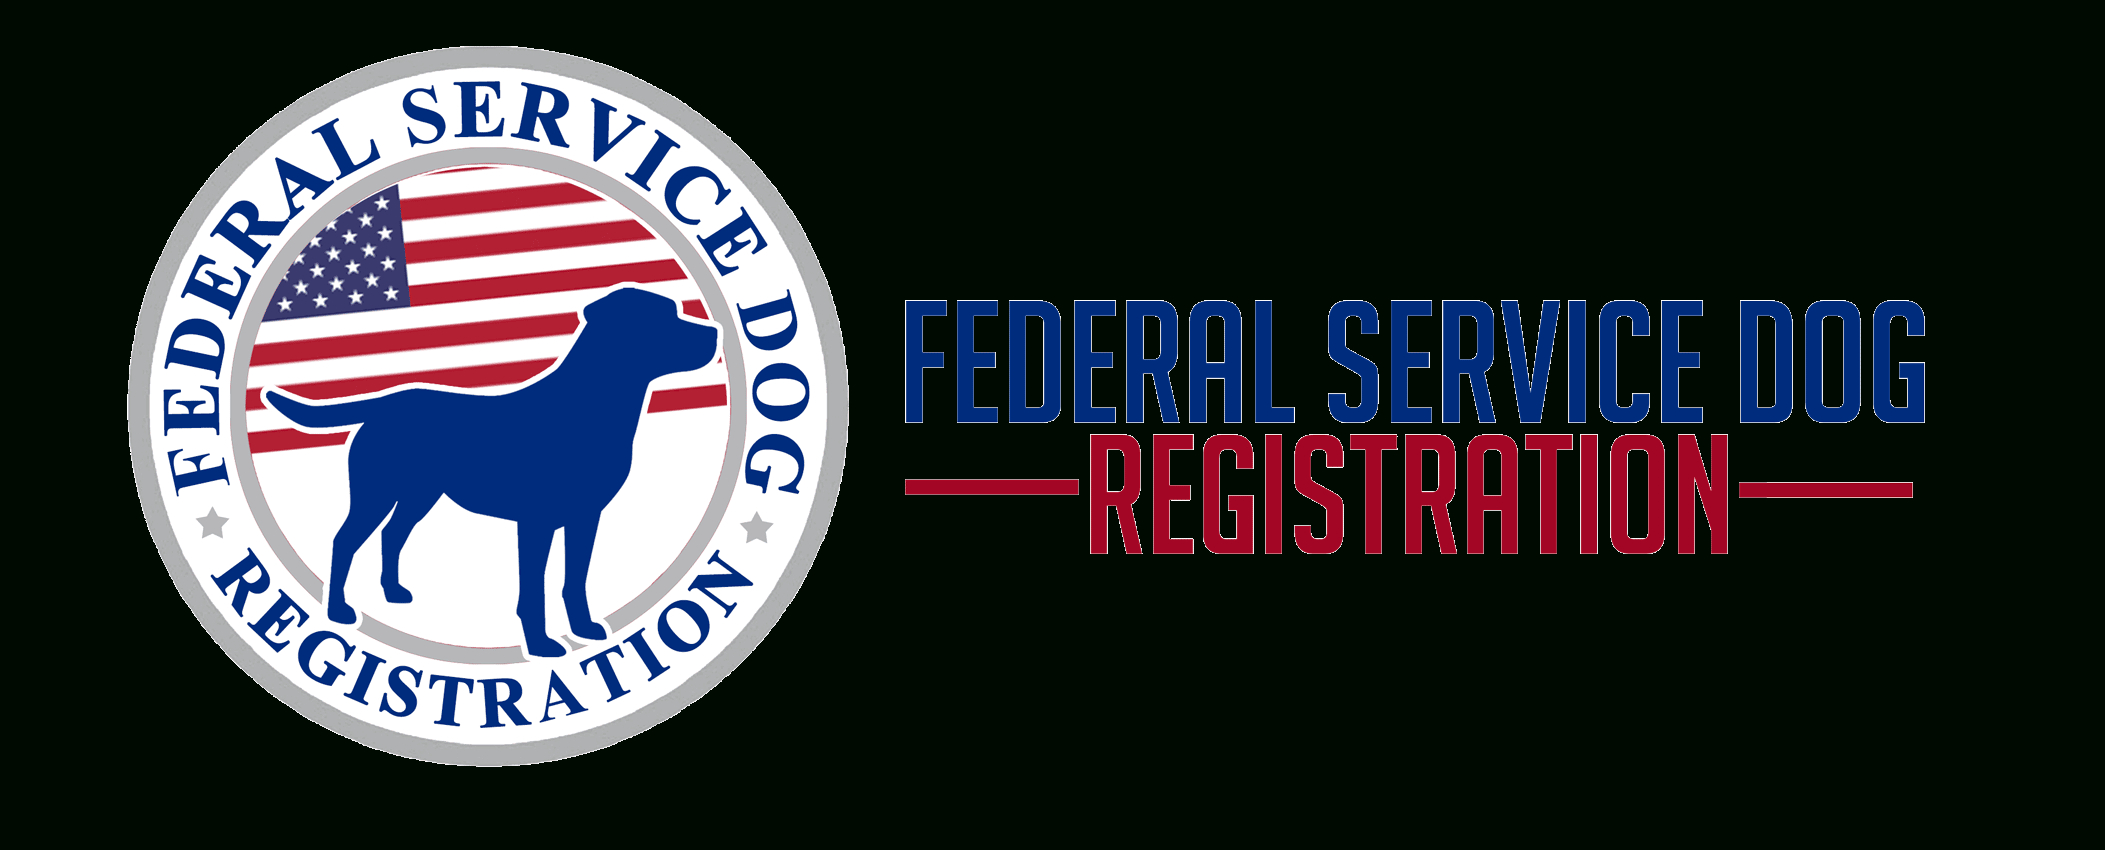 Free Service Dog Registration|Free Service Dog Certification - Free Printable Service Dog